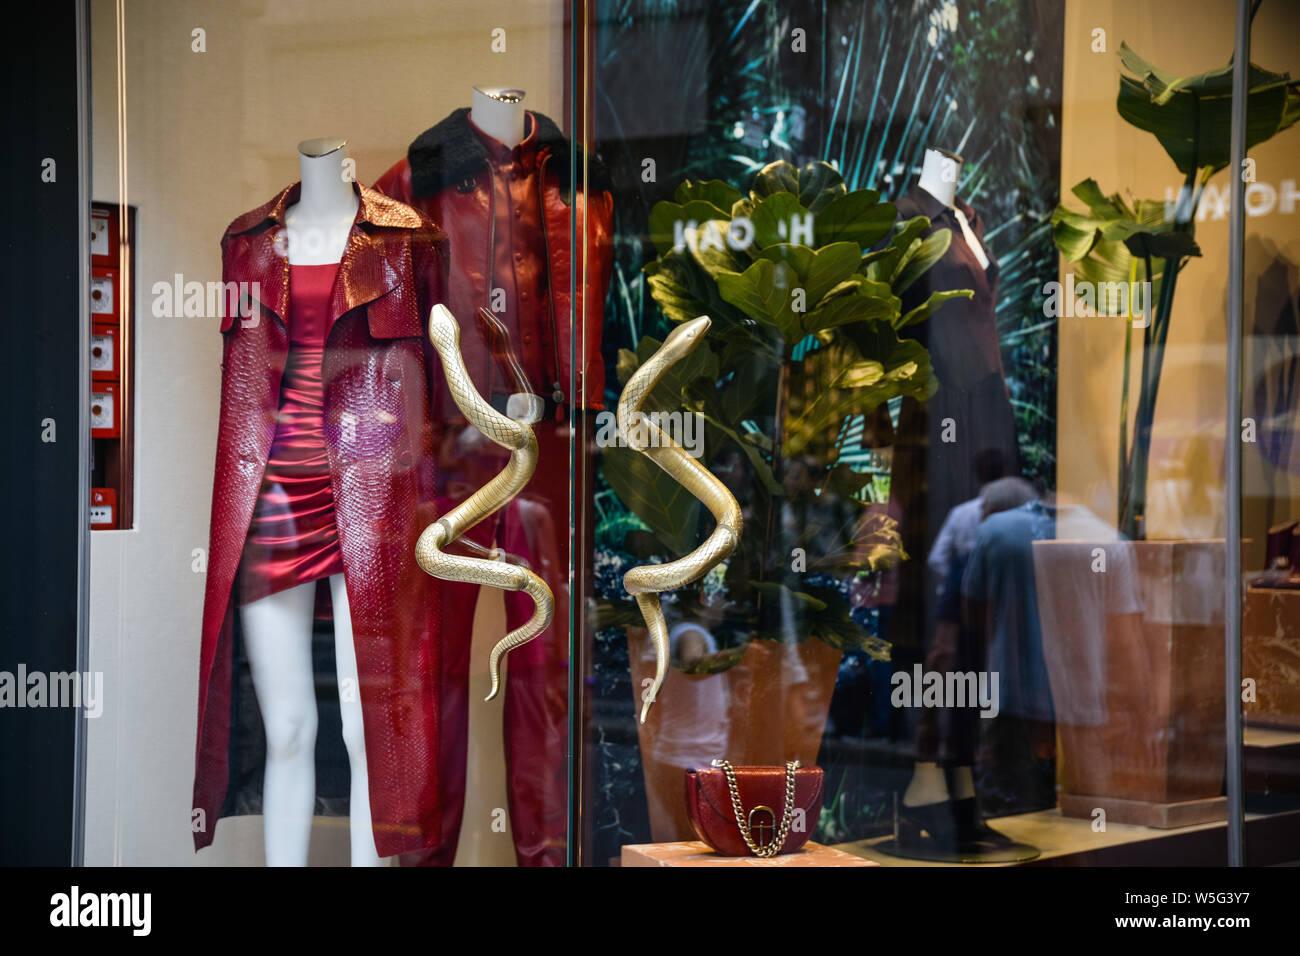 Milan, Italy - September 21, 2018: Roberto Cavalli store in Milan. Montenapoleone area. Fashion week Roberto Cavalli shopping. Stock Photo